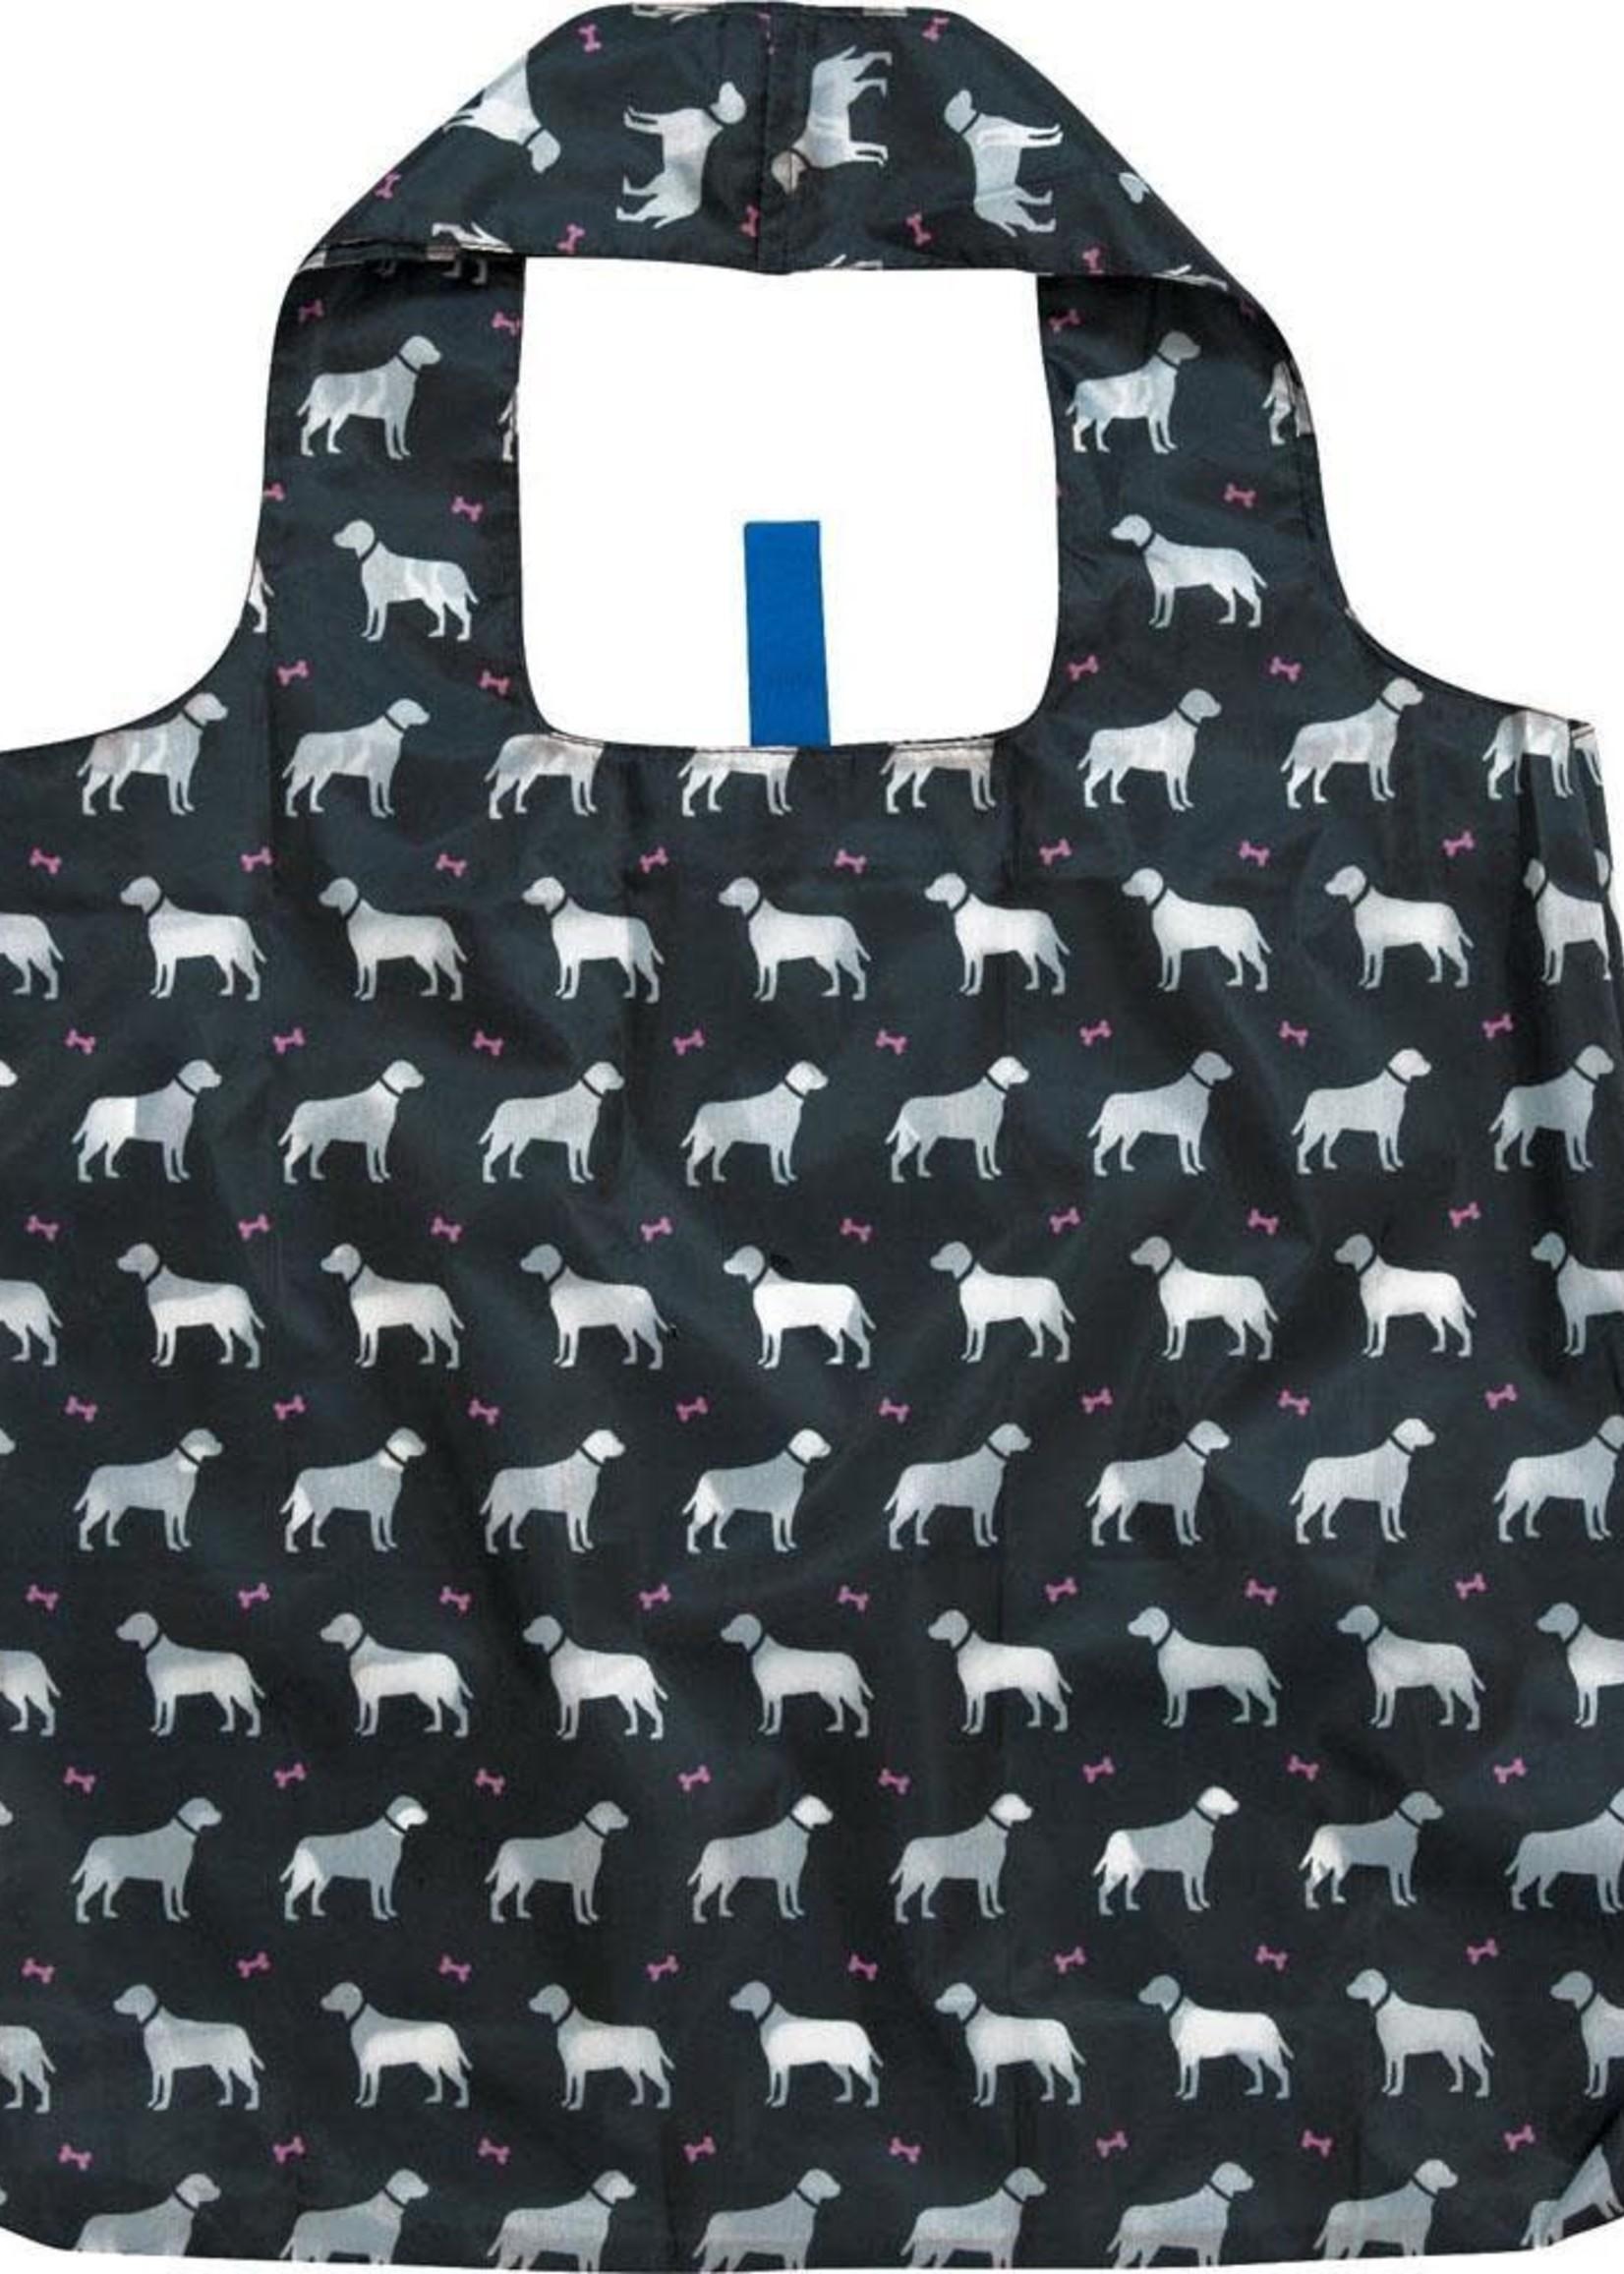 Blu Bag Reusable Shopping Bag